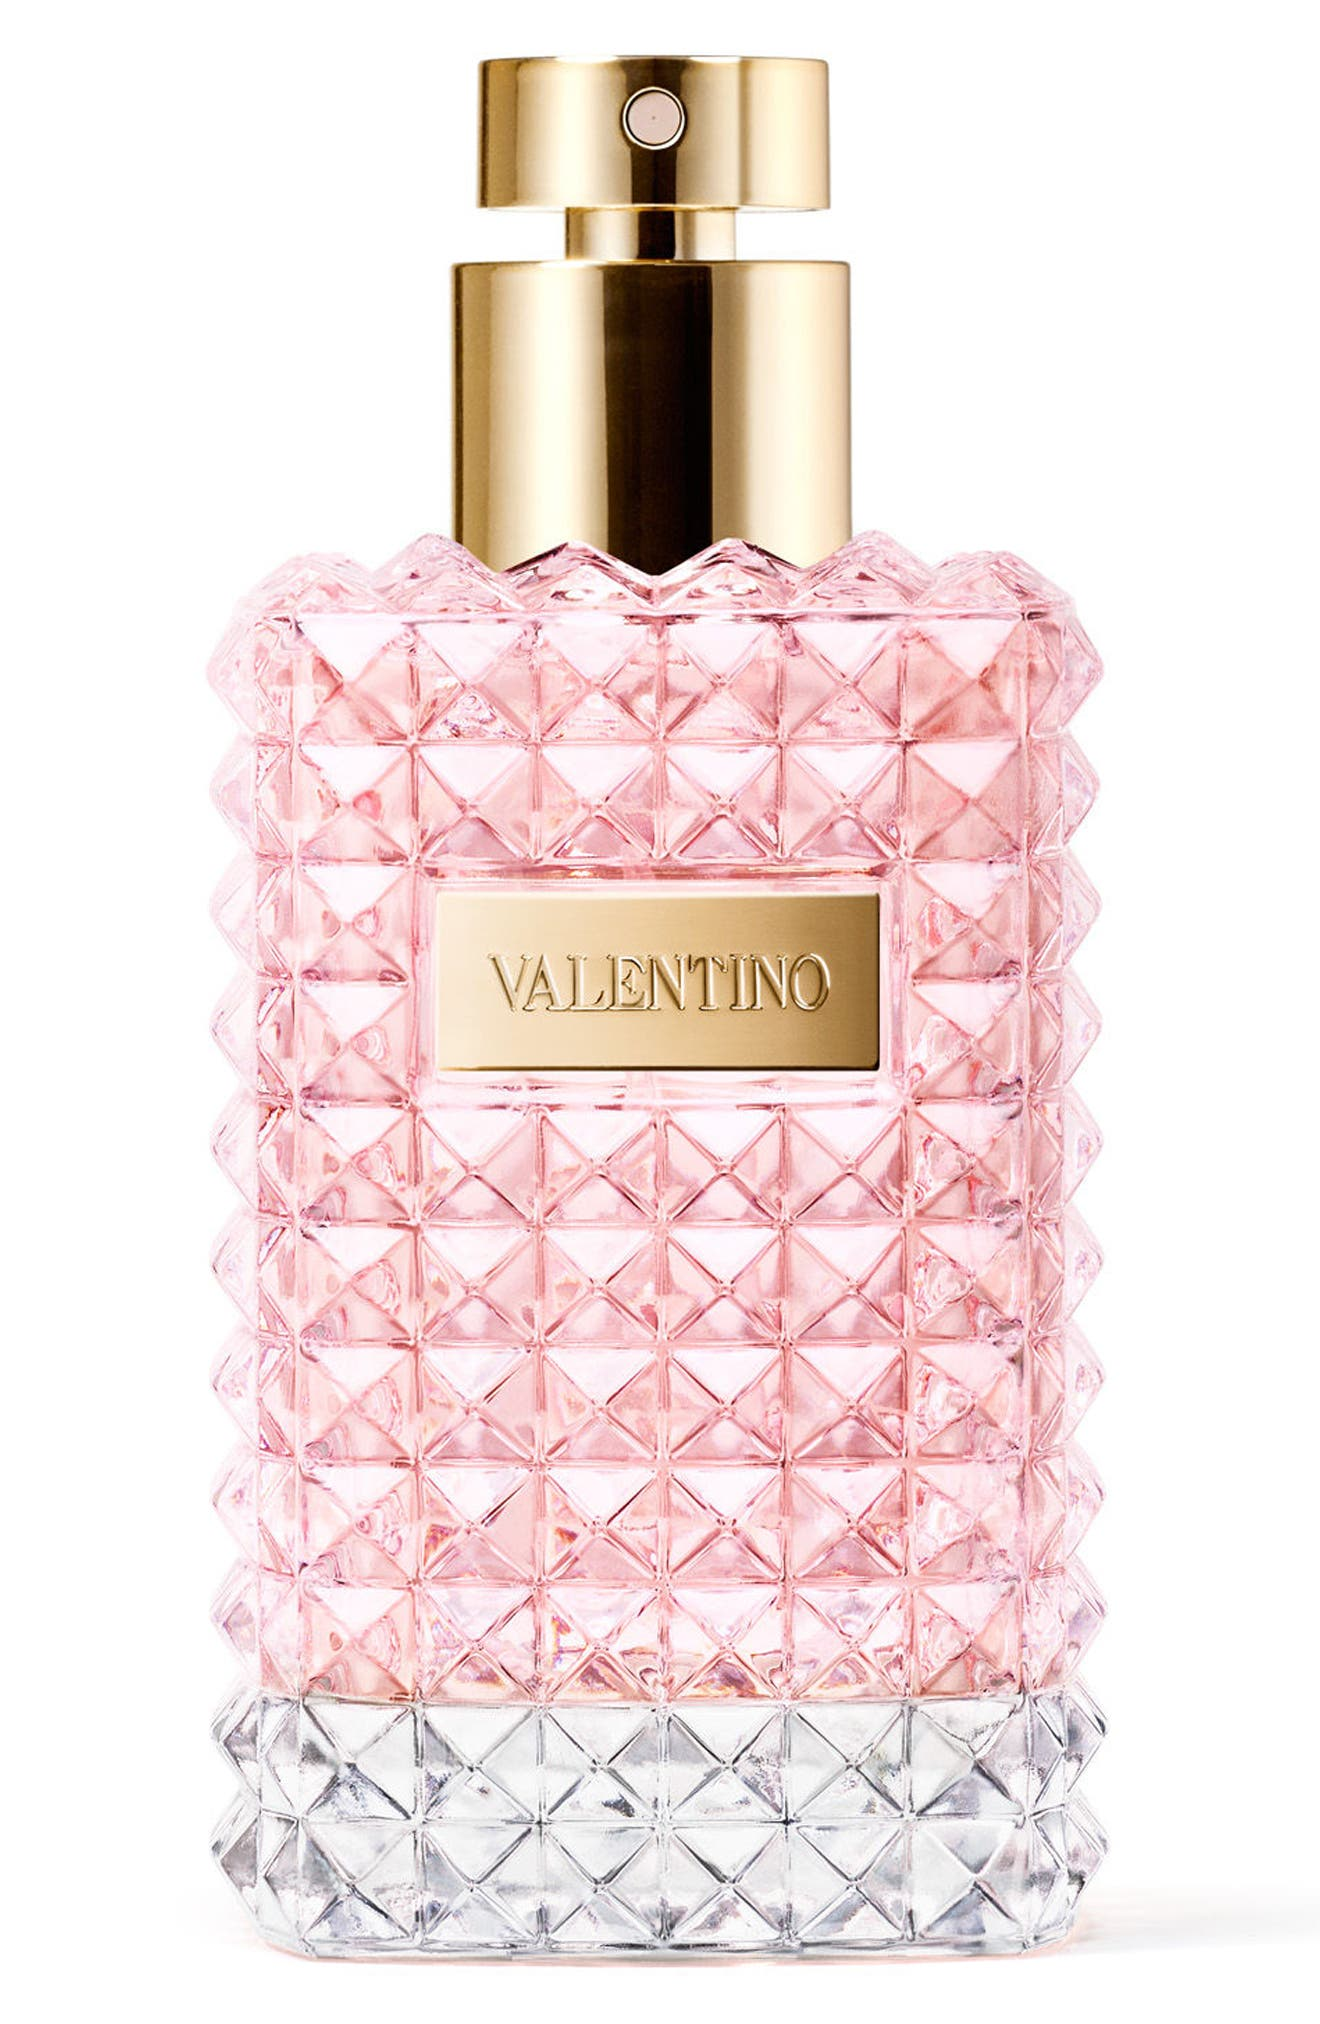 Alternate Image 1 Selected - Valentino Donna Acqua Eau de Toilette (Nordstrom Exclusive)